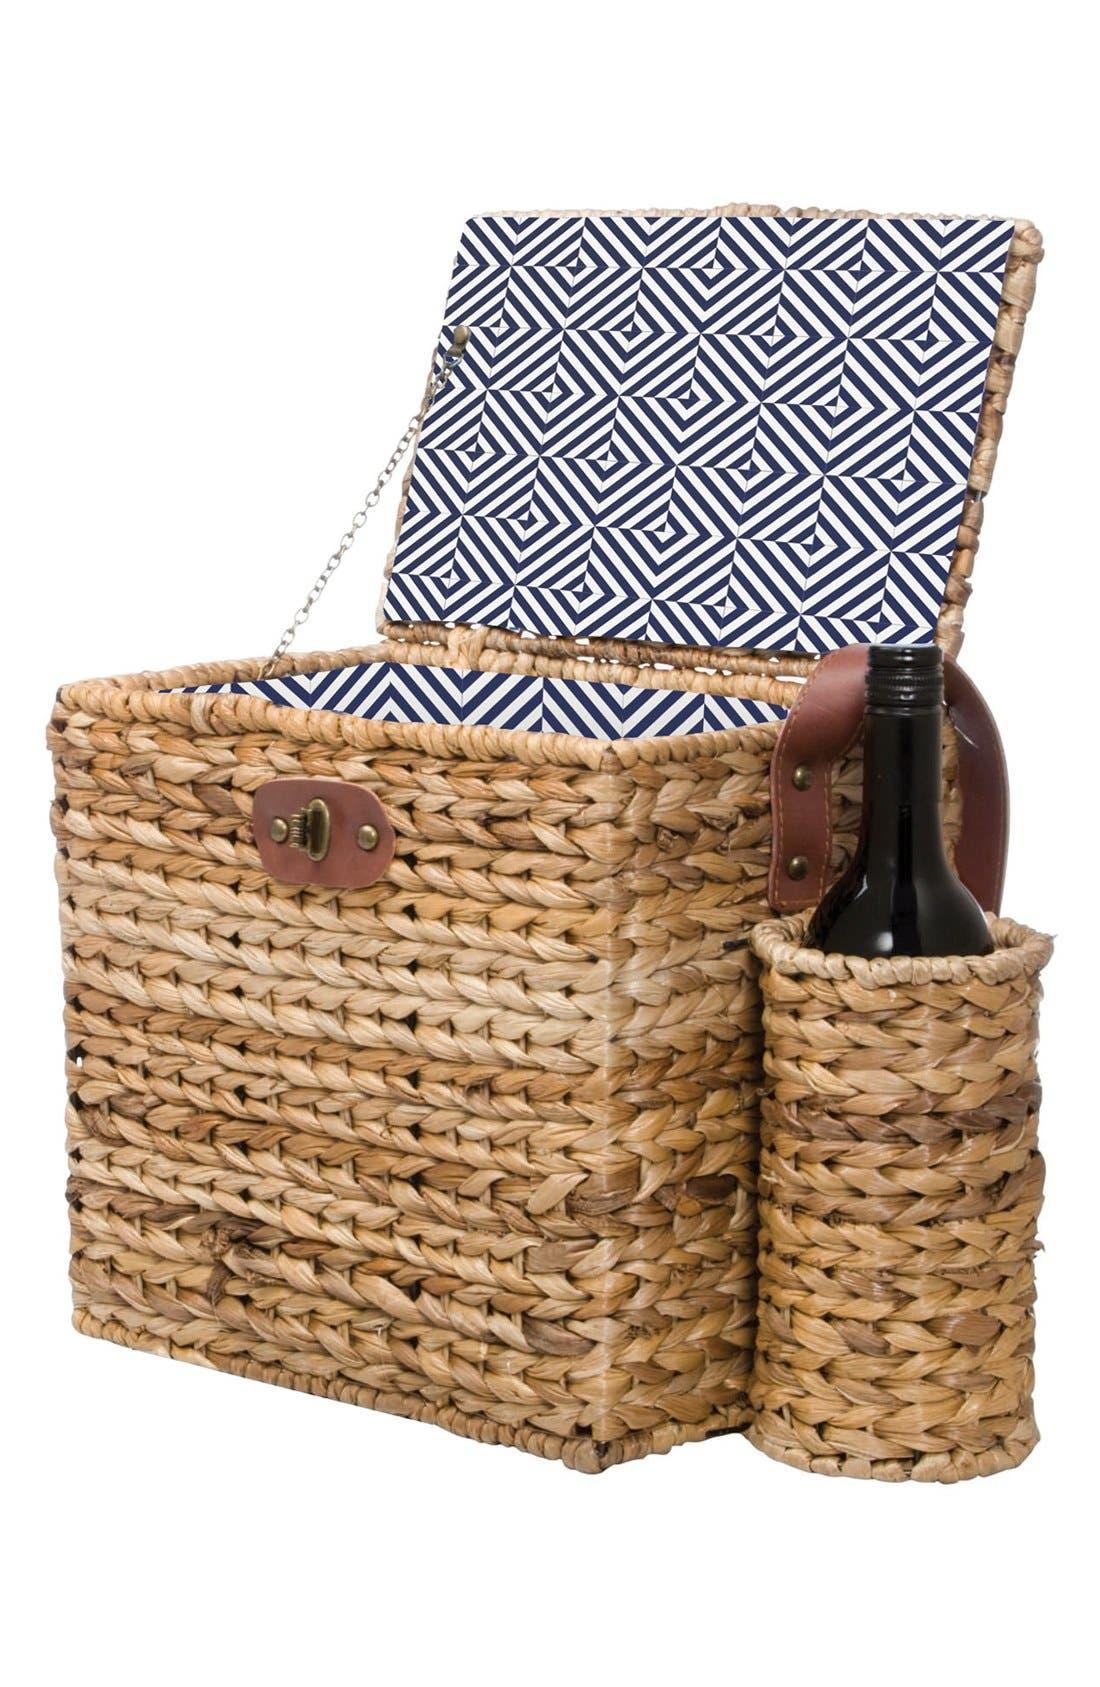 Alternate Image 1 Selected - Sunnylife Wicker Picnic Basket